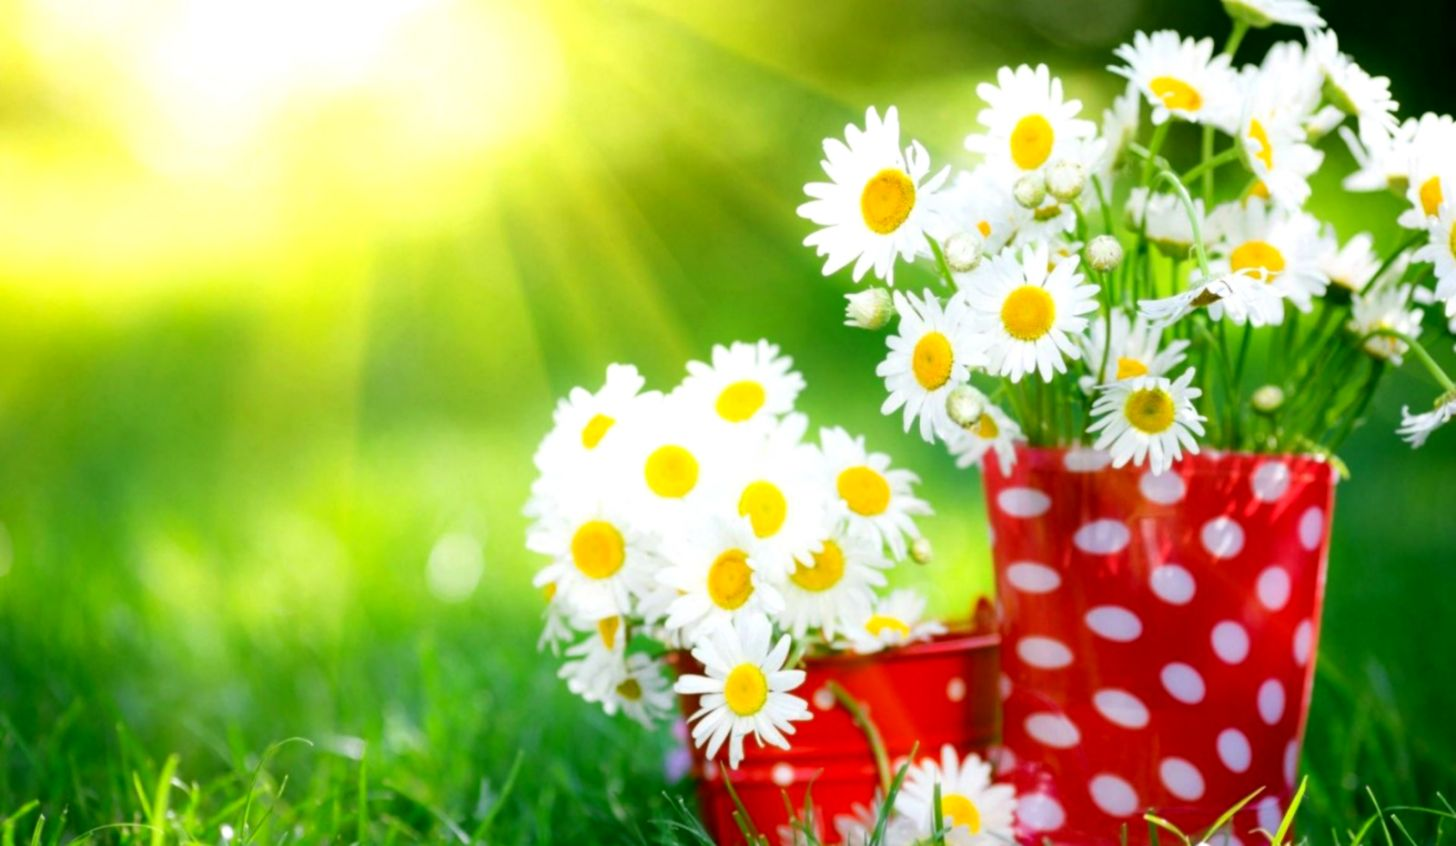 Flowers Nature Wallpapers Desktop Backgrounds Hd Wallpapers Plus